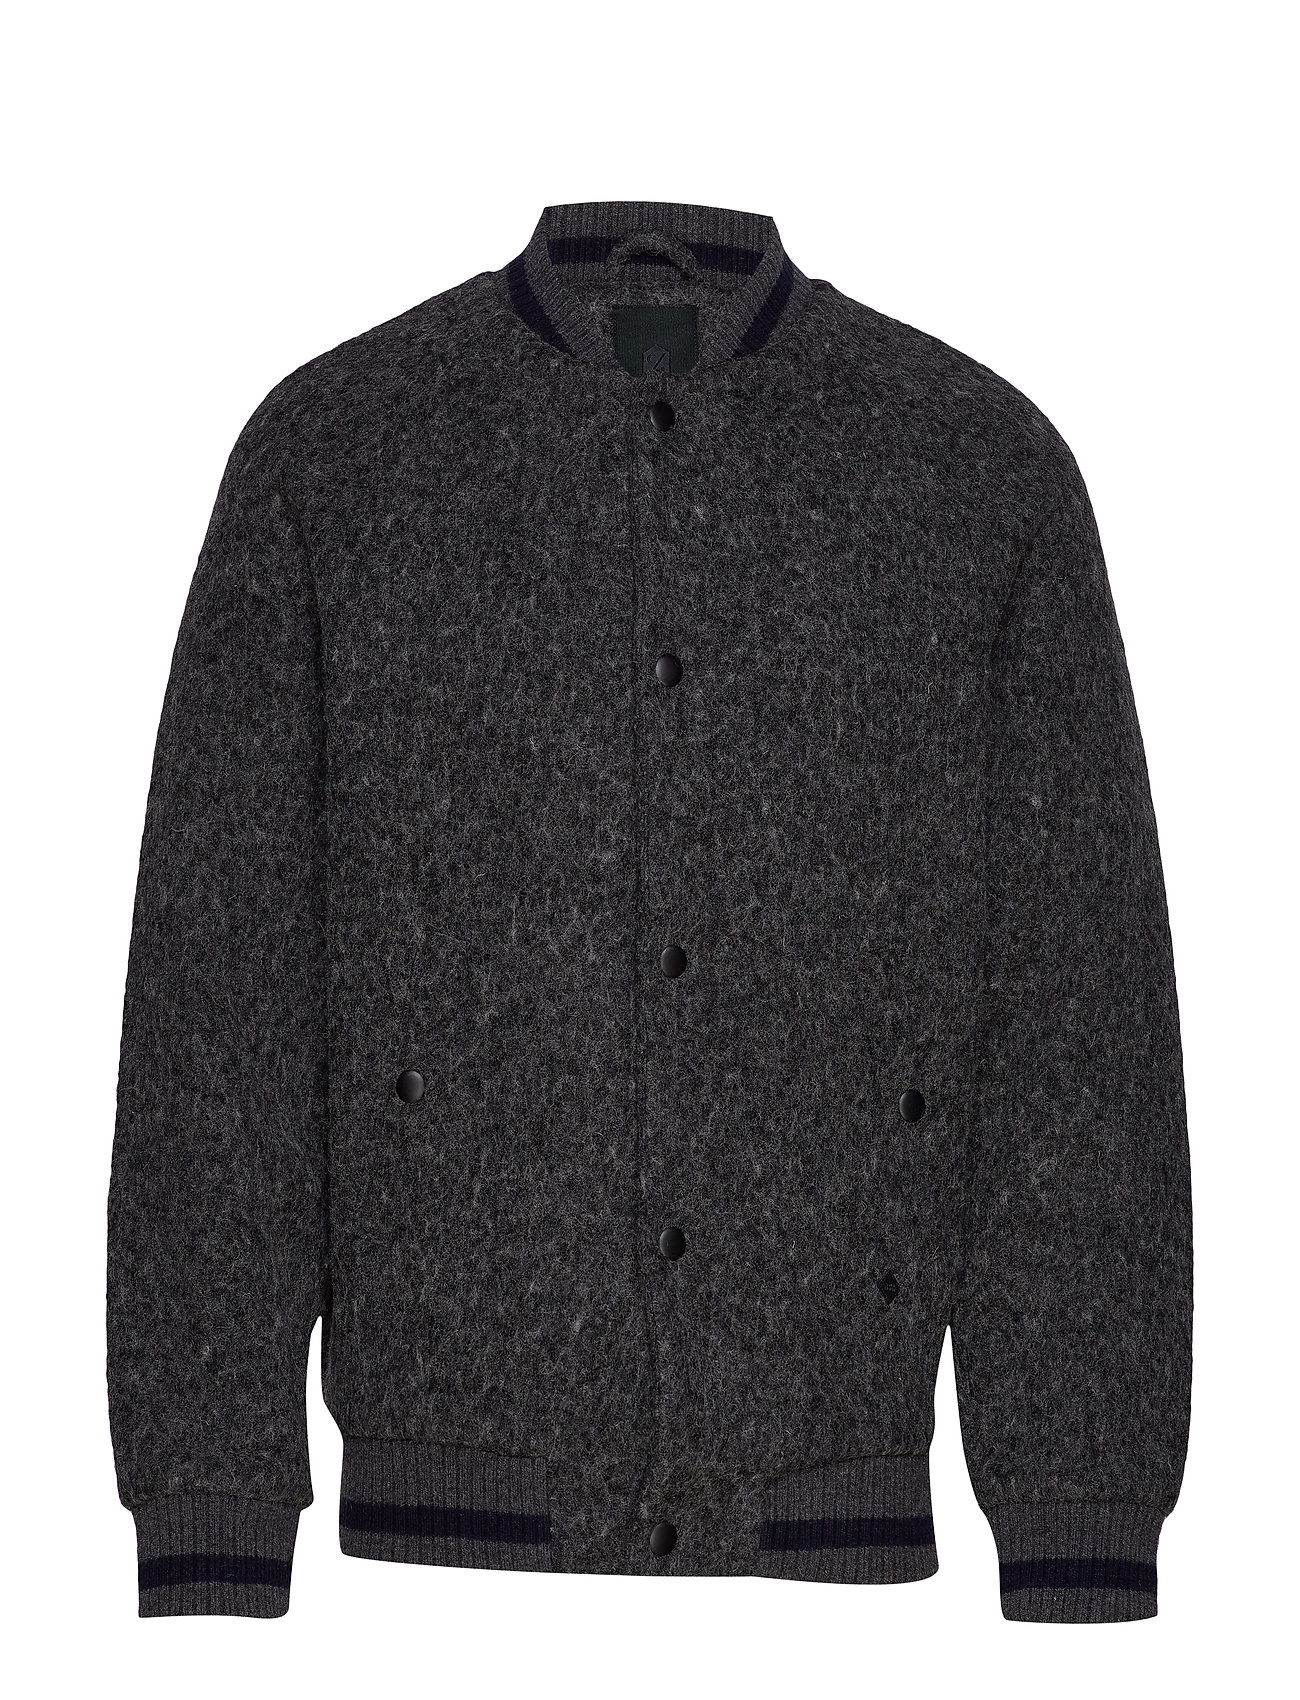 Casual Friday Outerwear - DARK GREY MELANGE